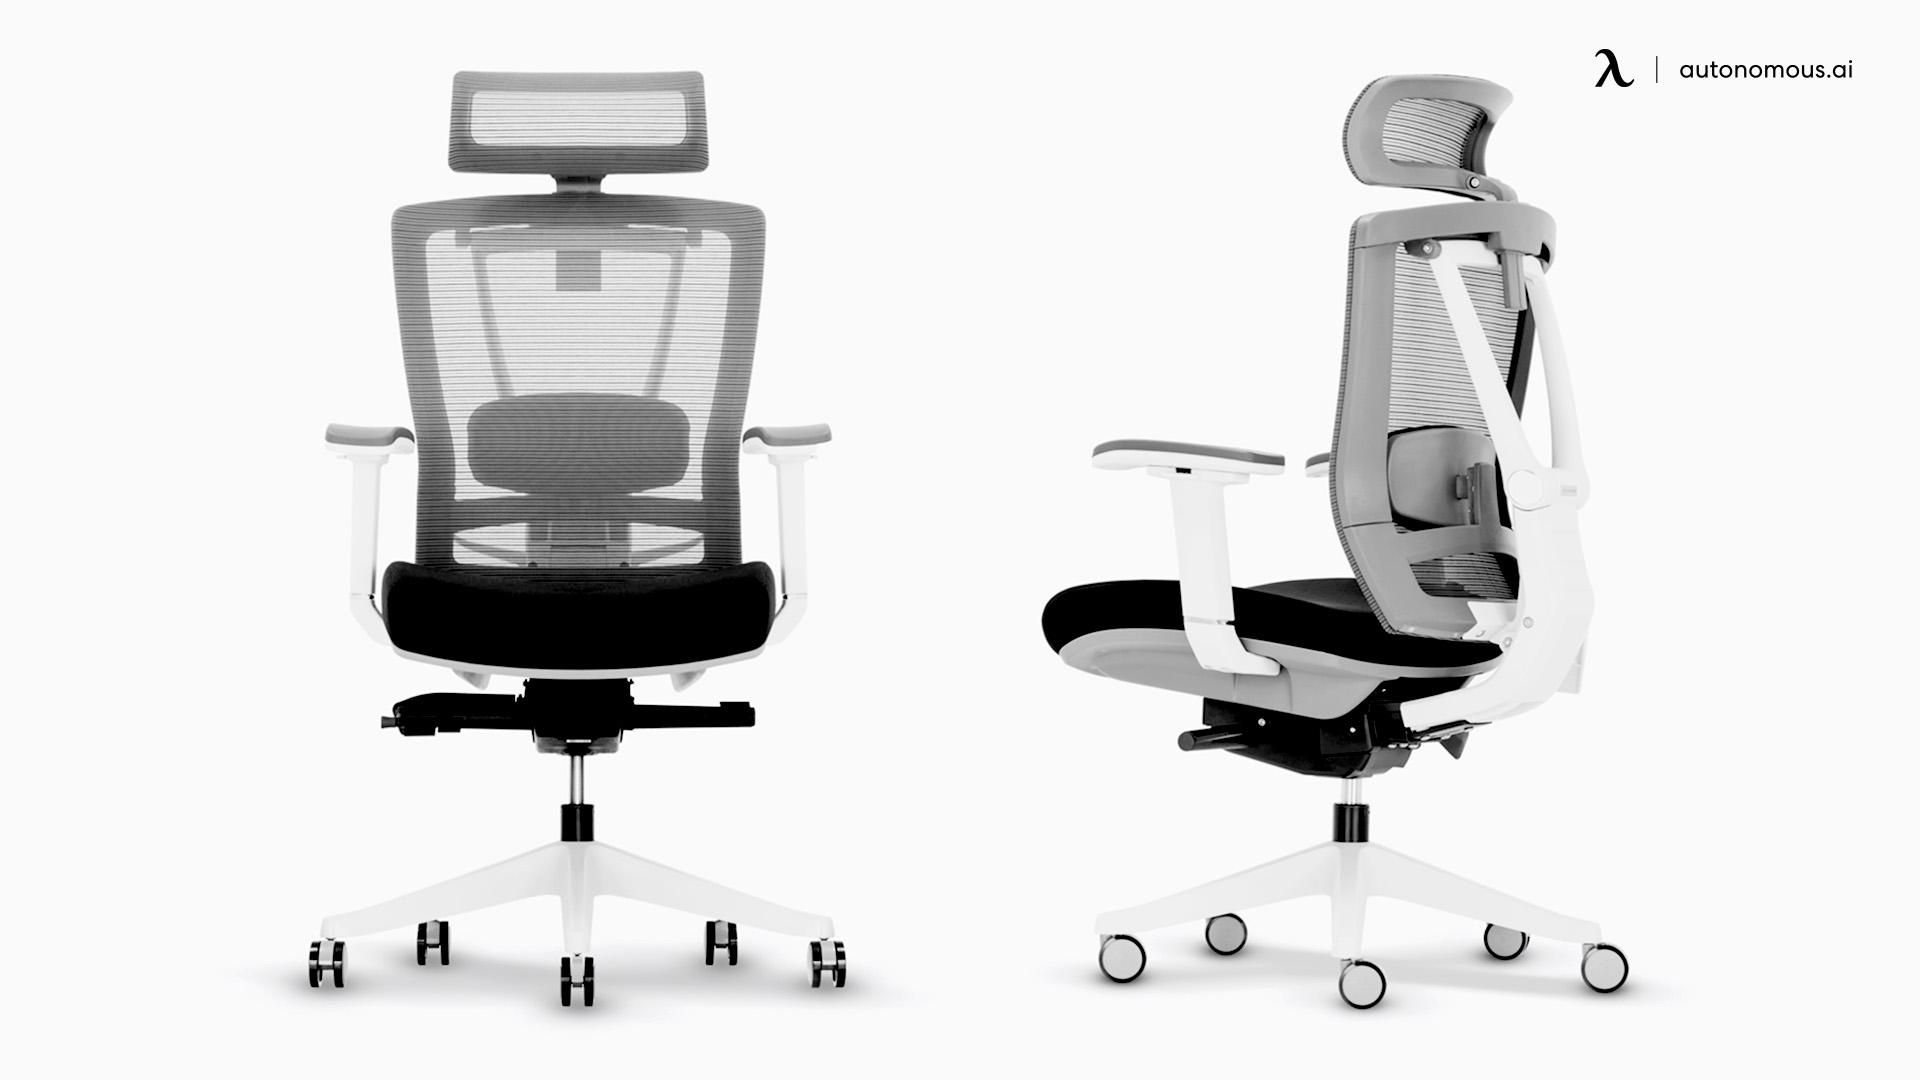 ErgoChair 2 by Autonomous